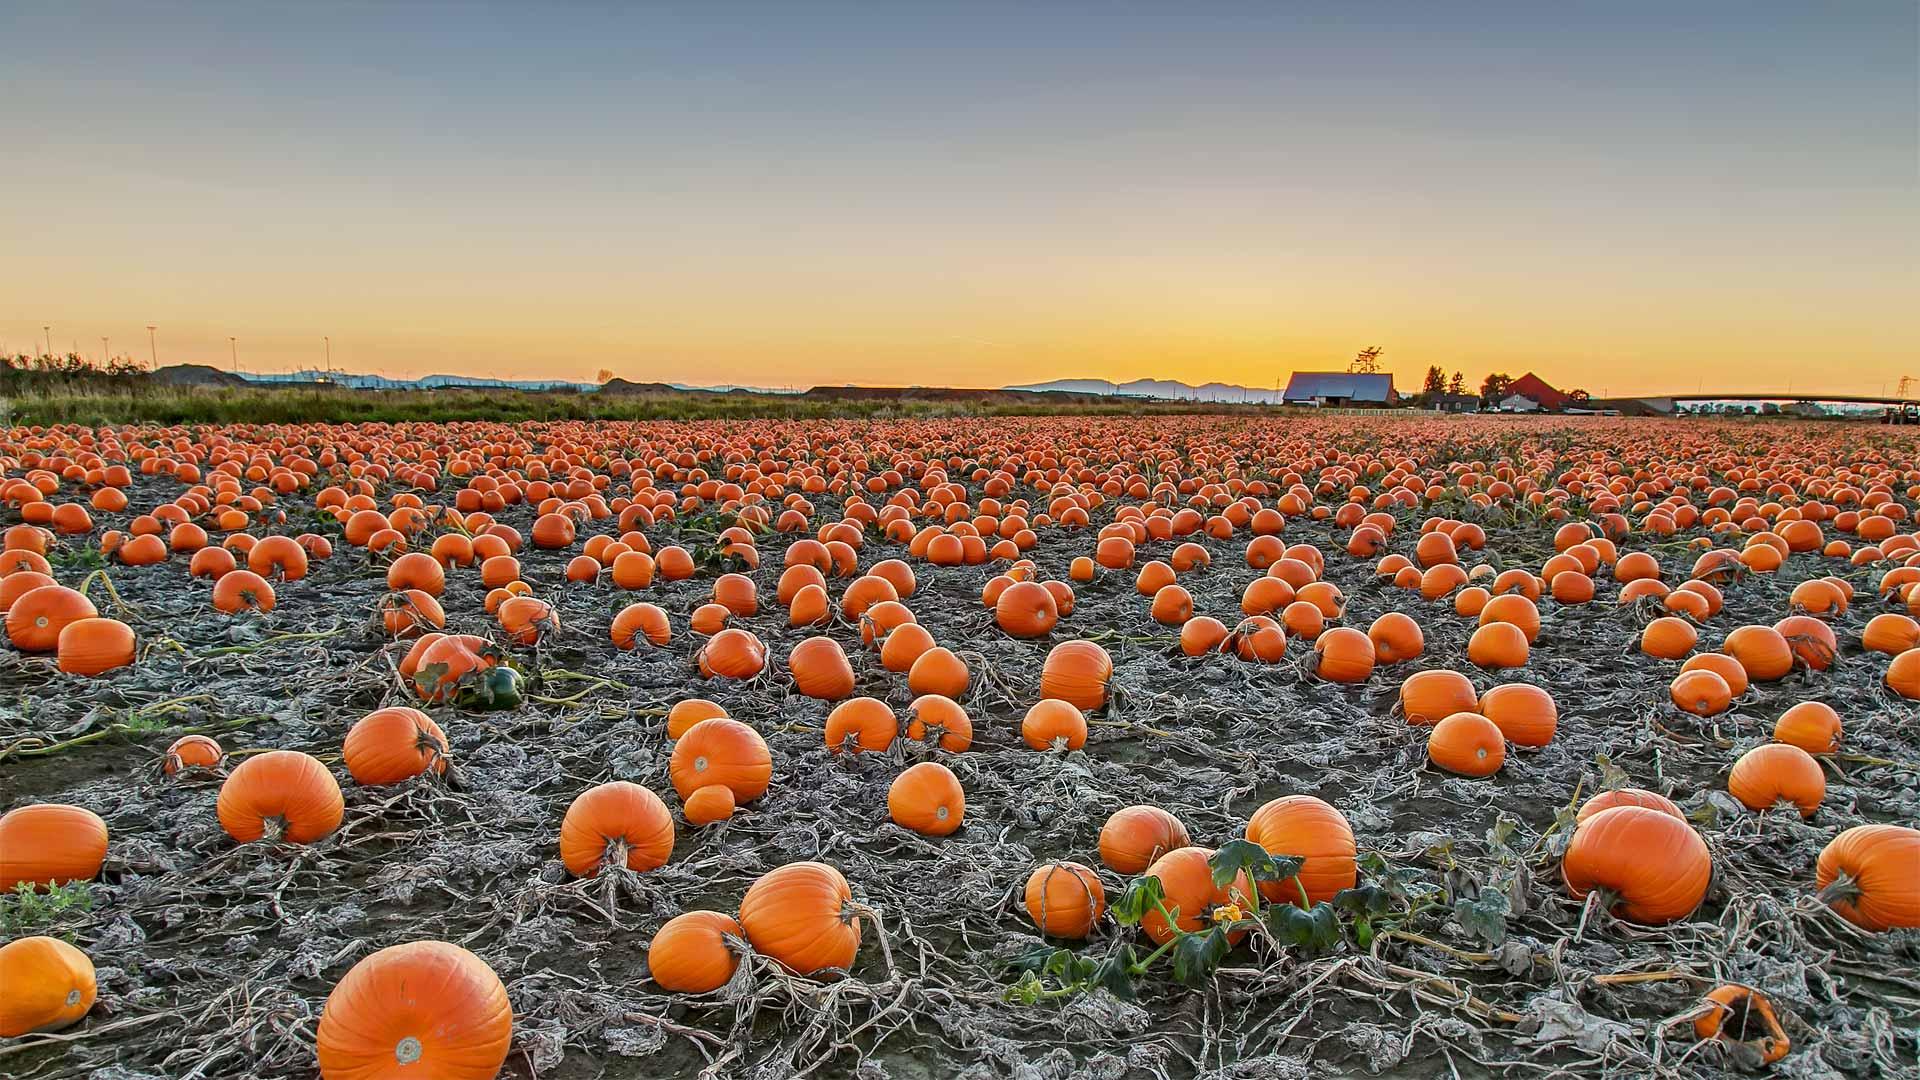 A pumpkin patch in British Columbia, Canada (© James Chen/Shutterstock)(Bing United States)